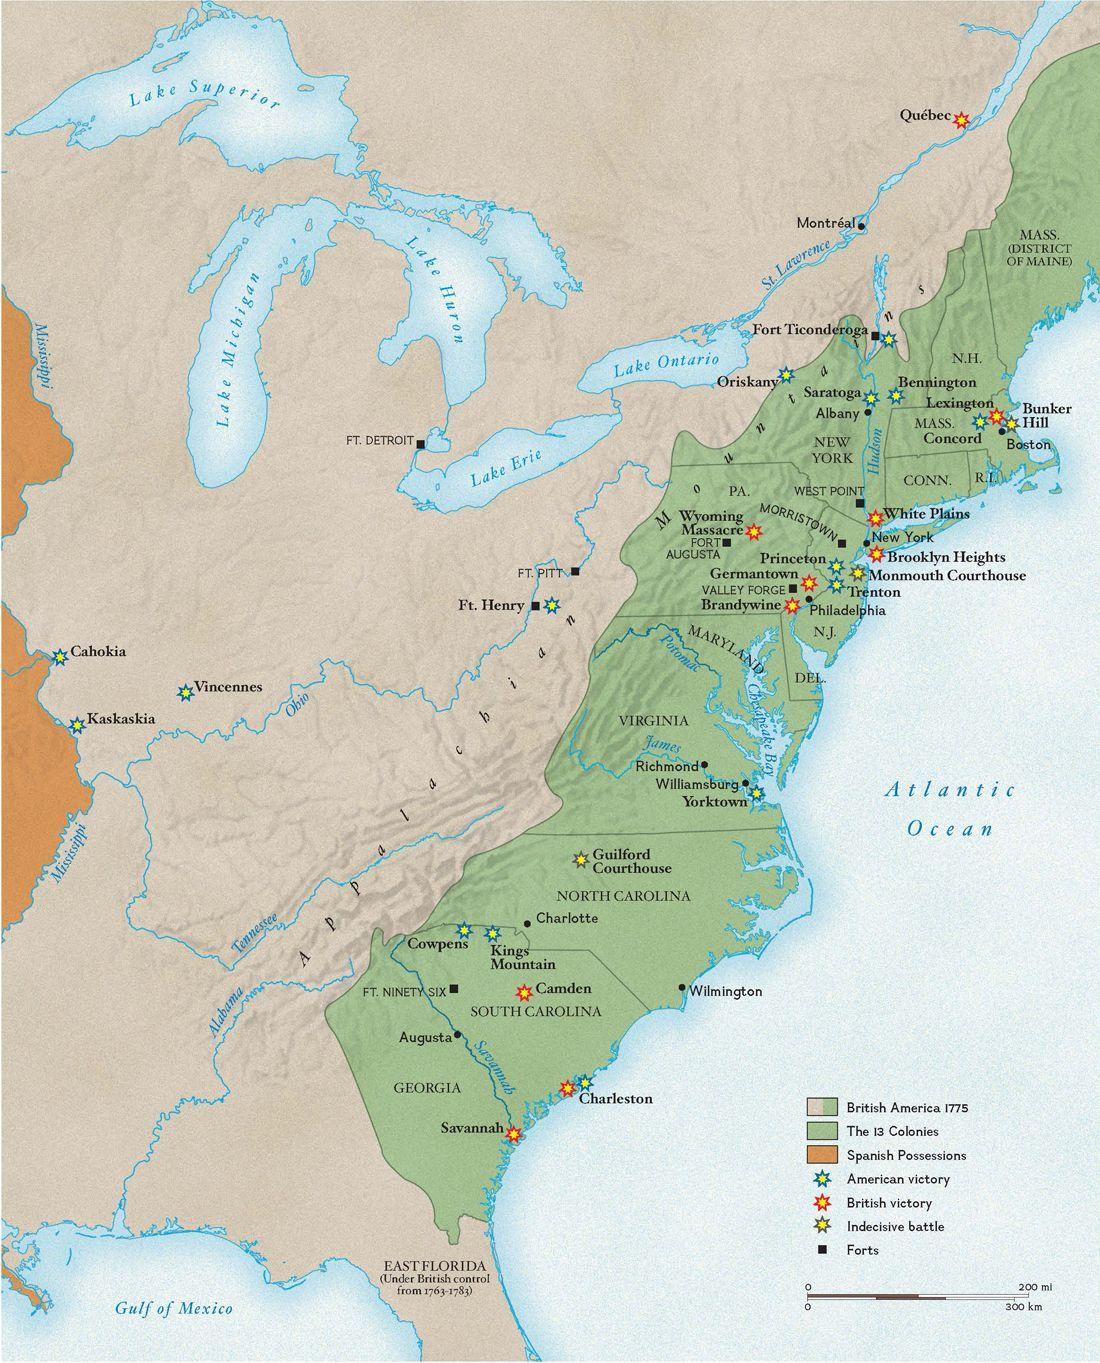 America's War For Independence Began On April 19, 1775